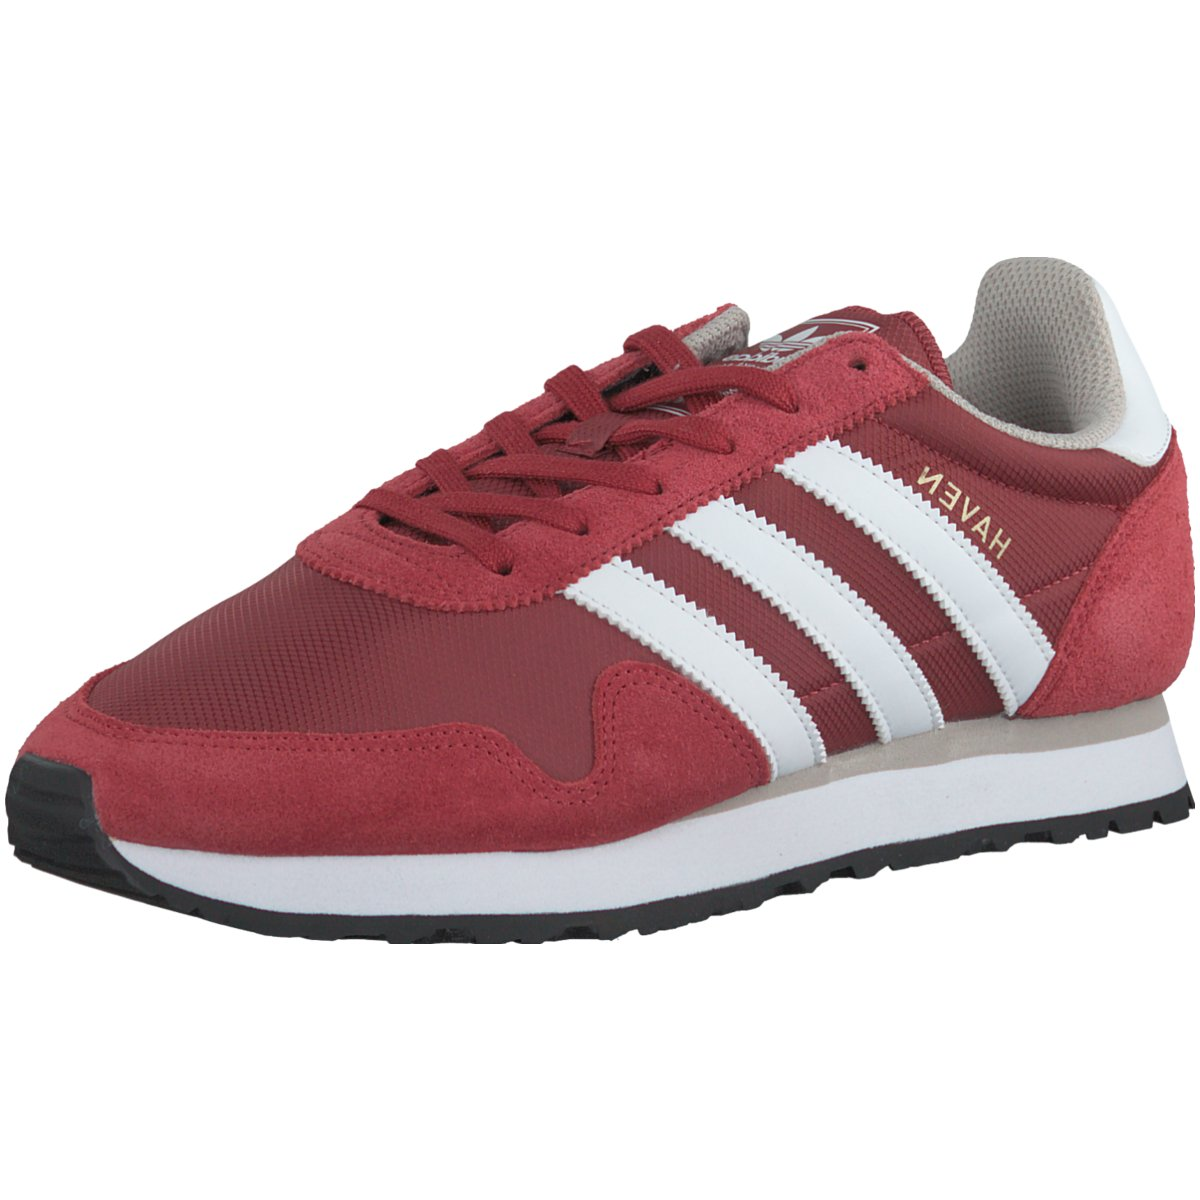 NEU adidas Herren Sneaker Haven Sneaker Herren Schuhe rot BB1281 rot 274671